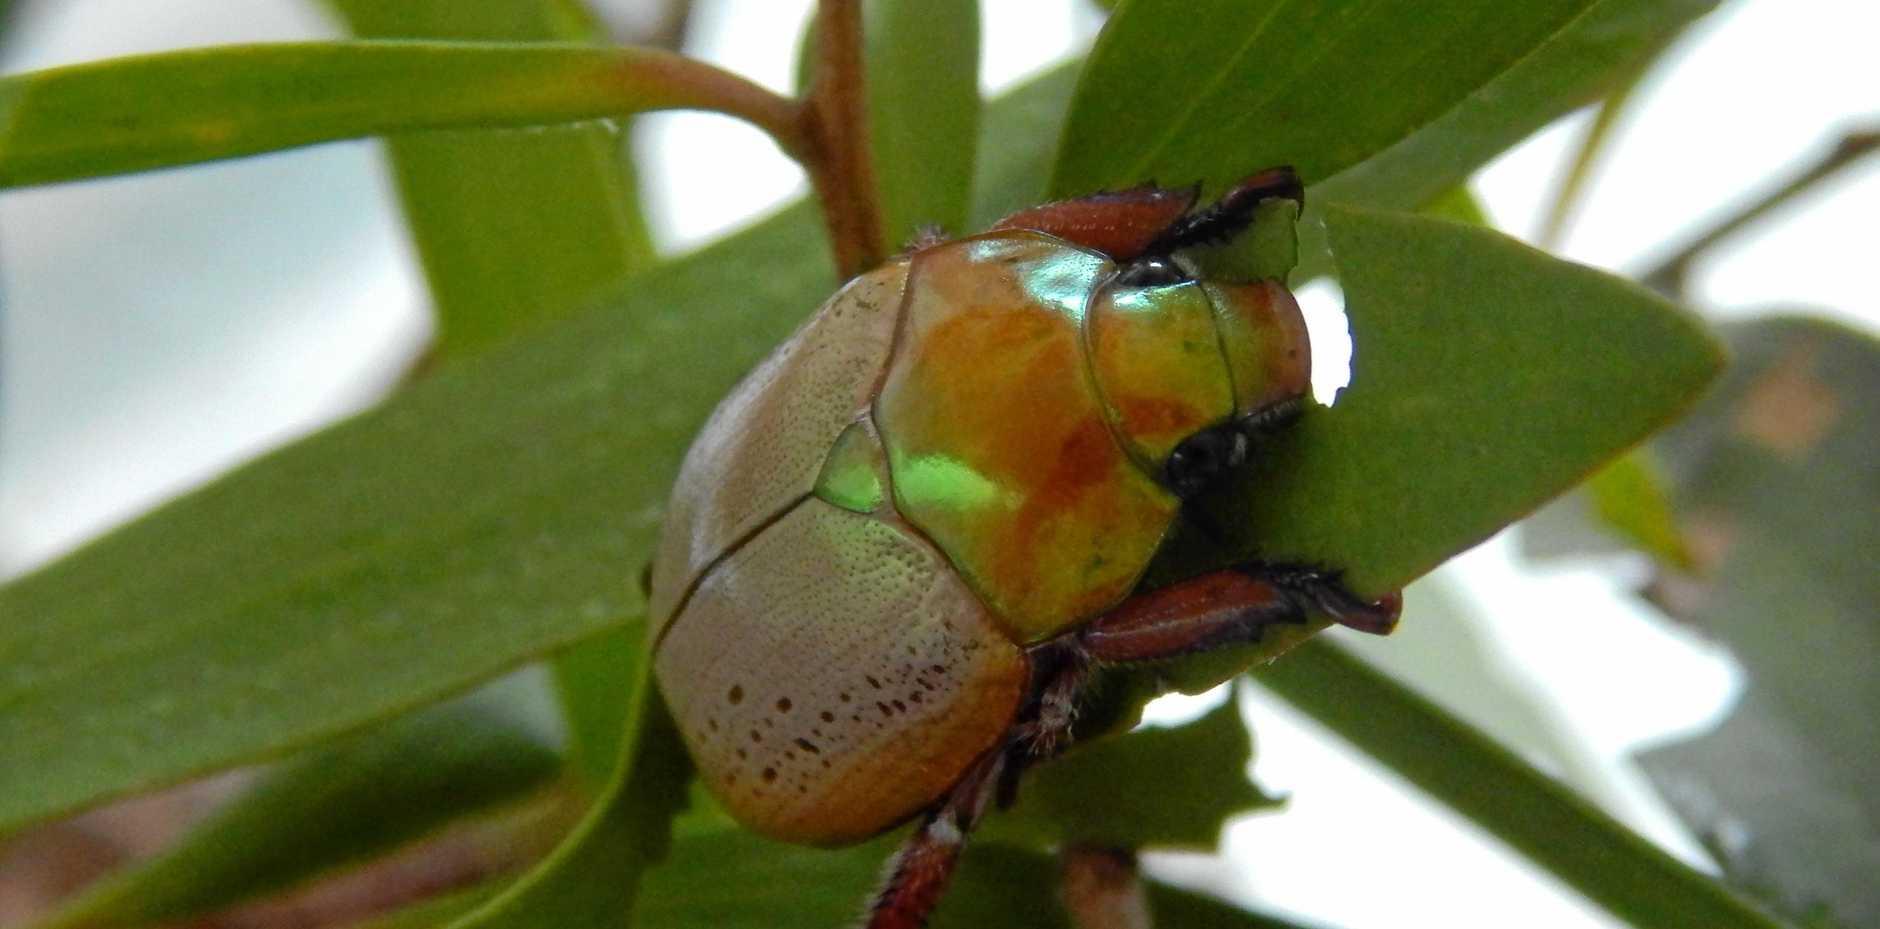 FESTIVE FLAIR: A golden Christmas beetle enjoying some eucalyptus leaves.